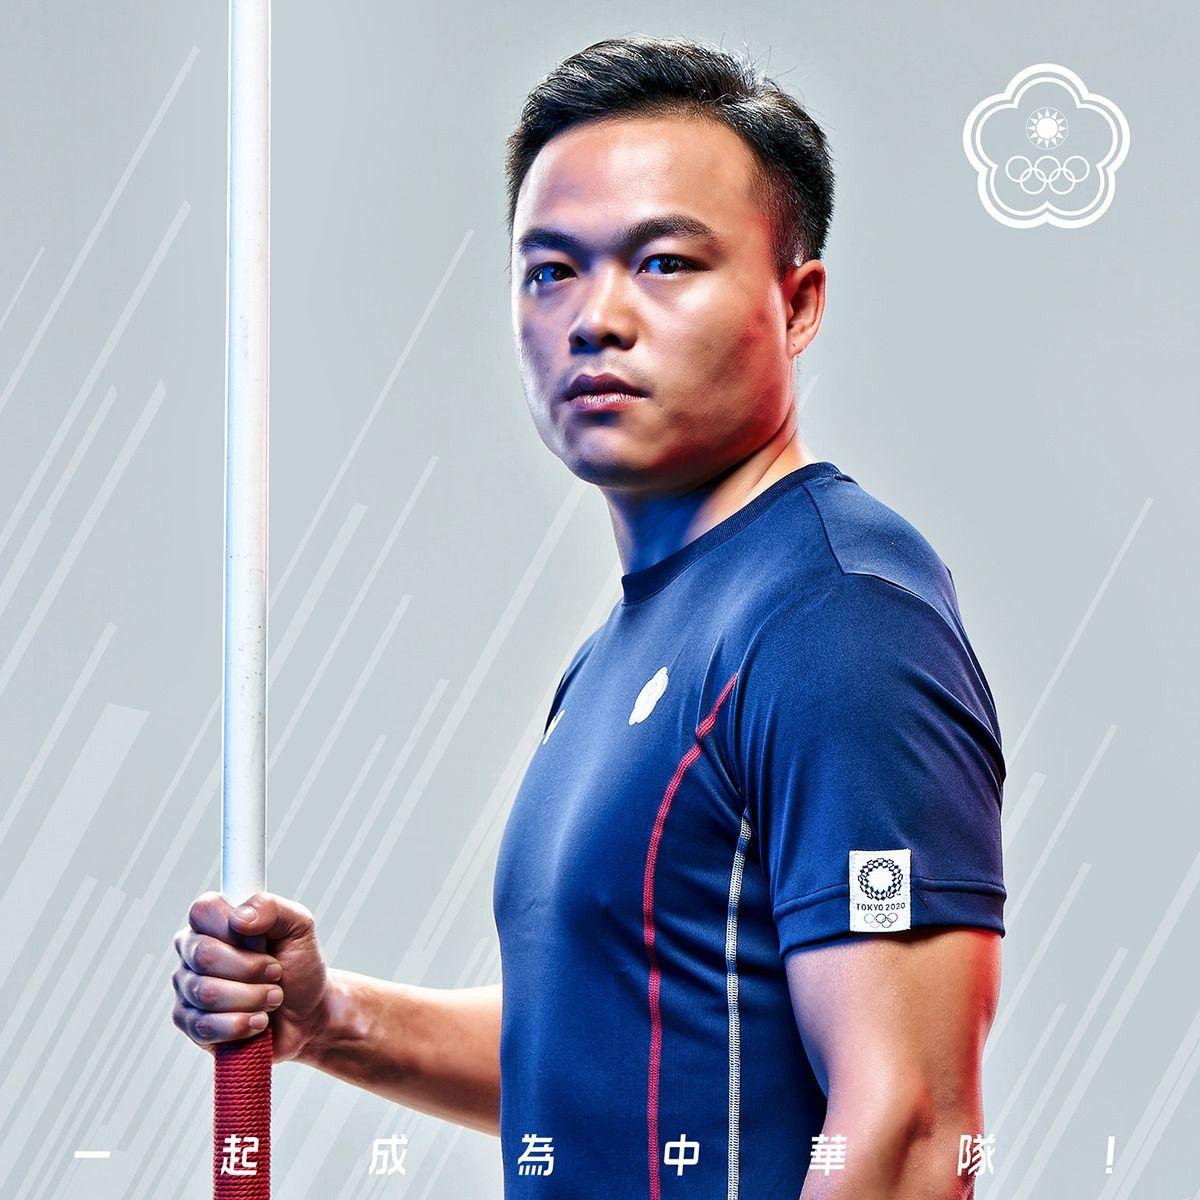 鄭兆村。(圖片來源/中華奧會 Chinese Taipei Olympic Committee@Facebook)